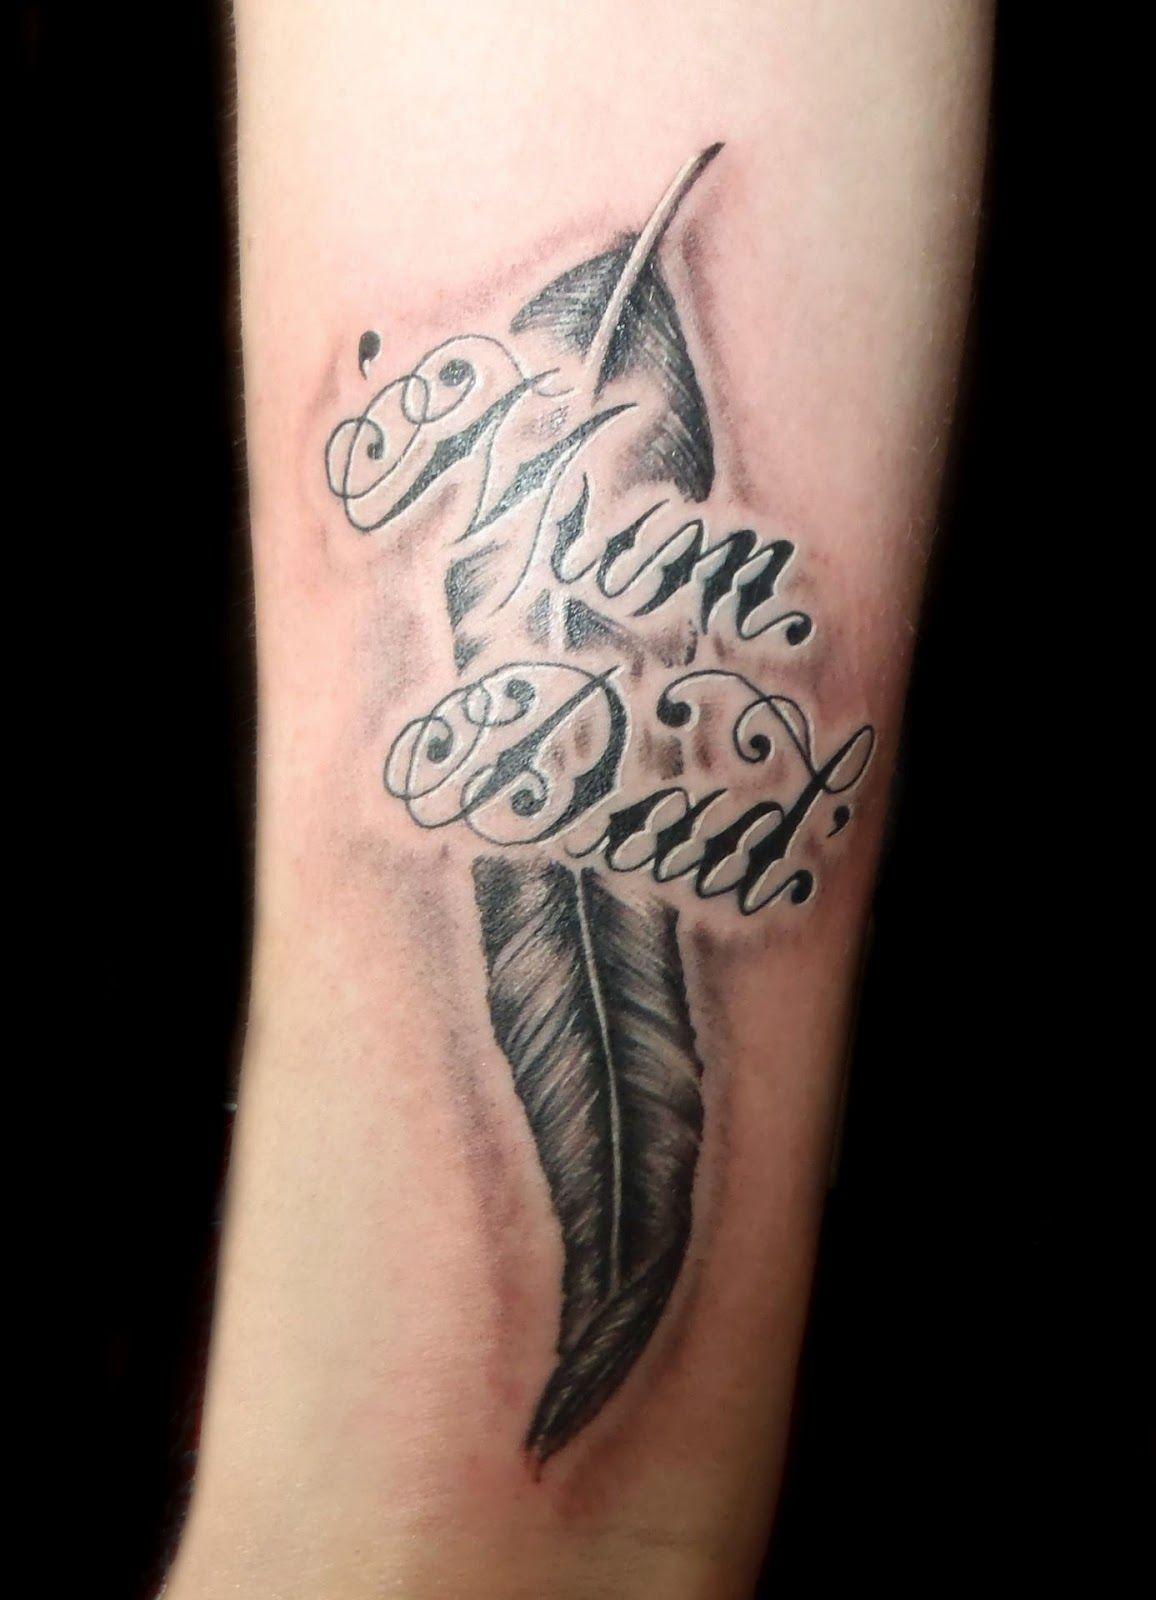 Mom Dad Tattoo Designs For Men Feather tattoo mom dad